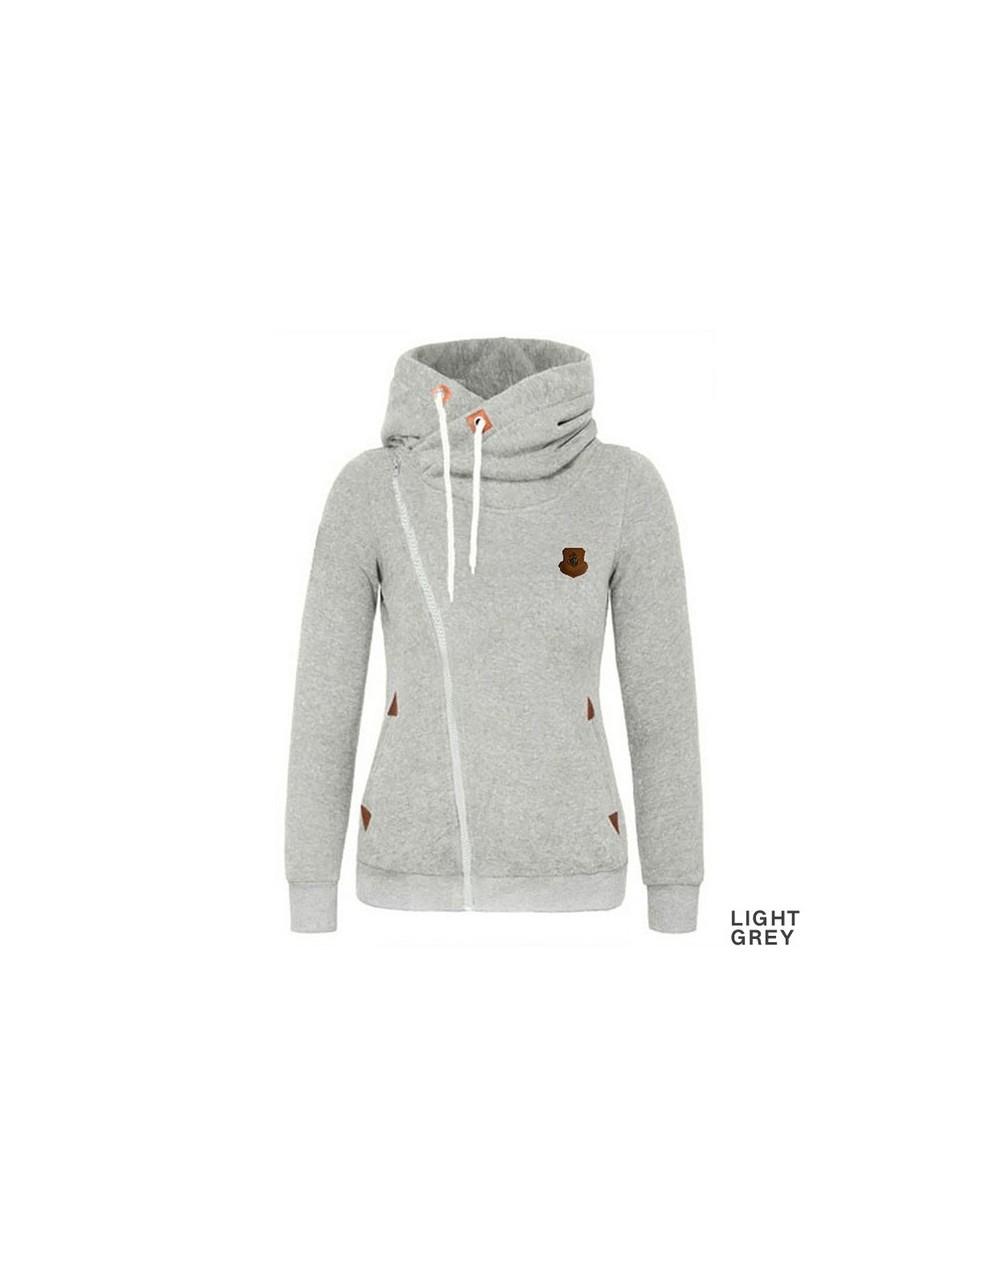 2018 Hoodie Women Sweatshirt Sweat Turn-down Collar Cardigans Tracksuit Female Bomber Jacket Women Basic Coats Chaquetas Muj...